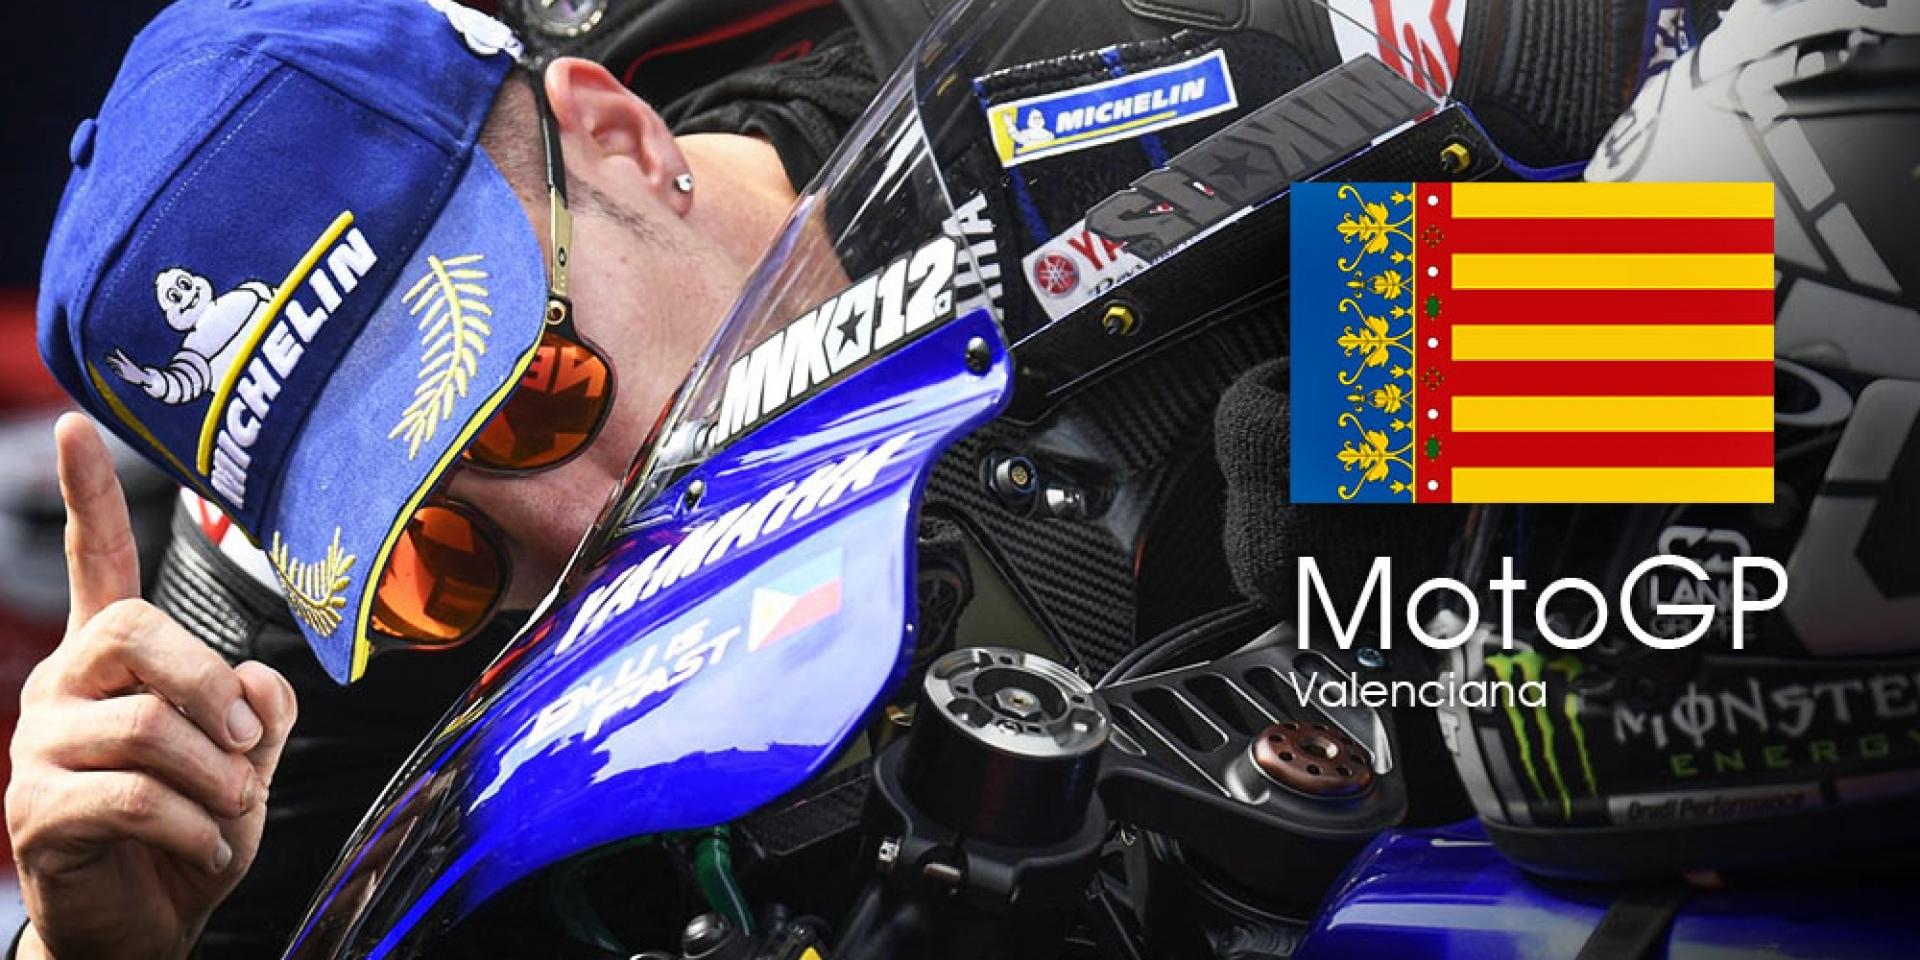 MotoGP 2019 瓦倫西亞站 轉播時間